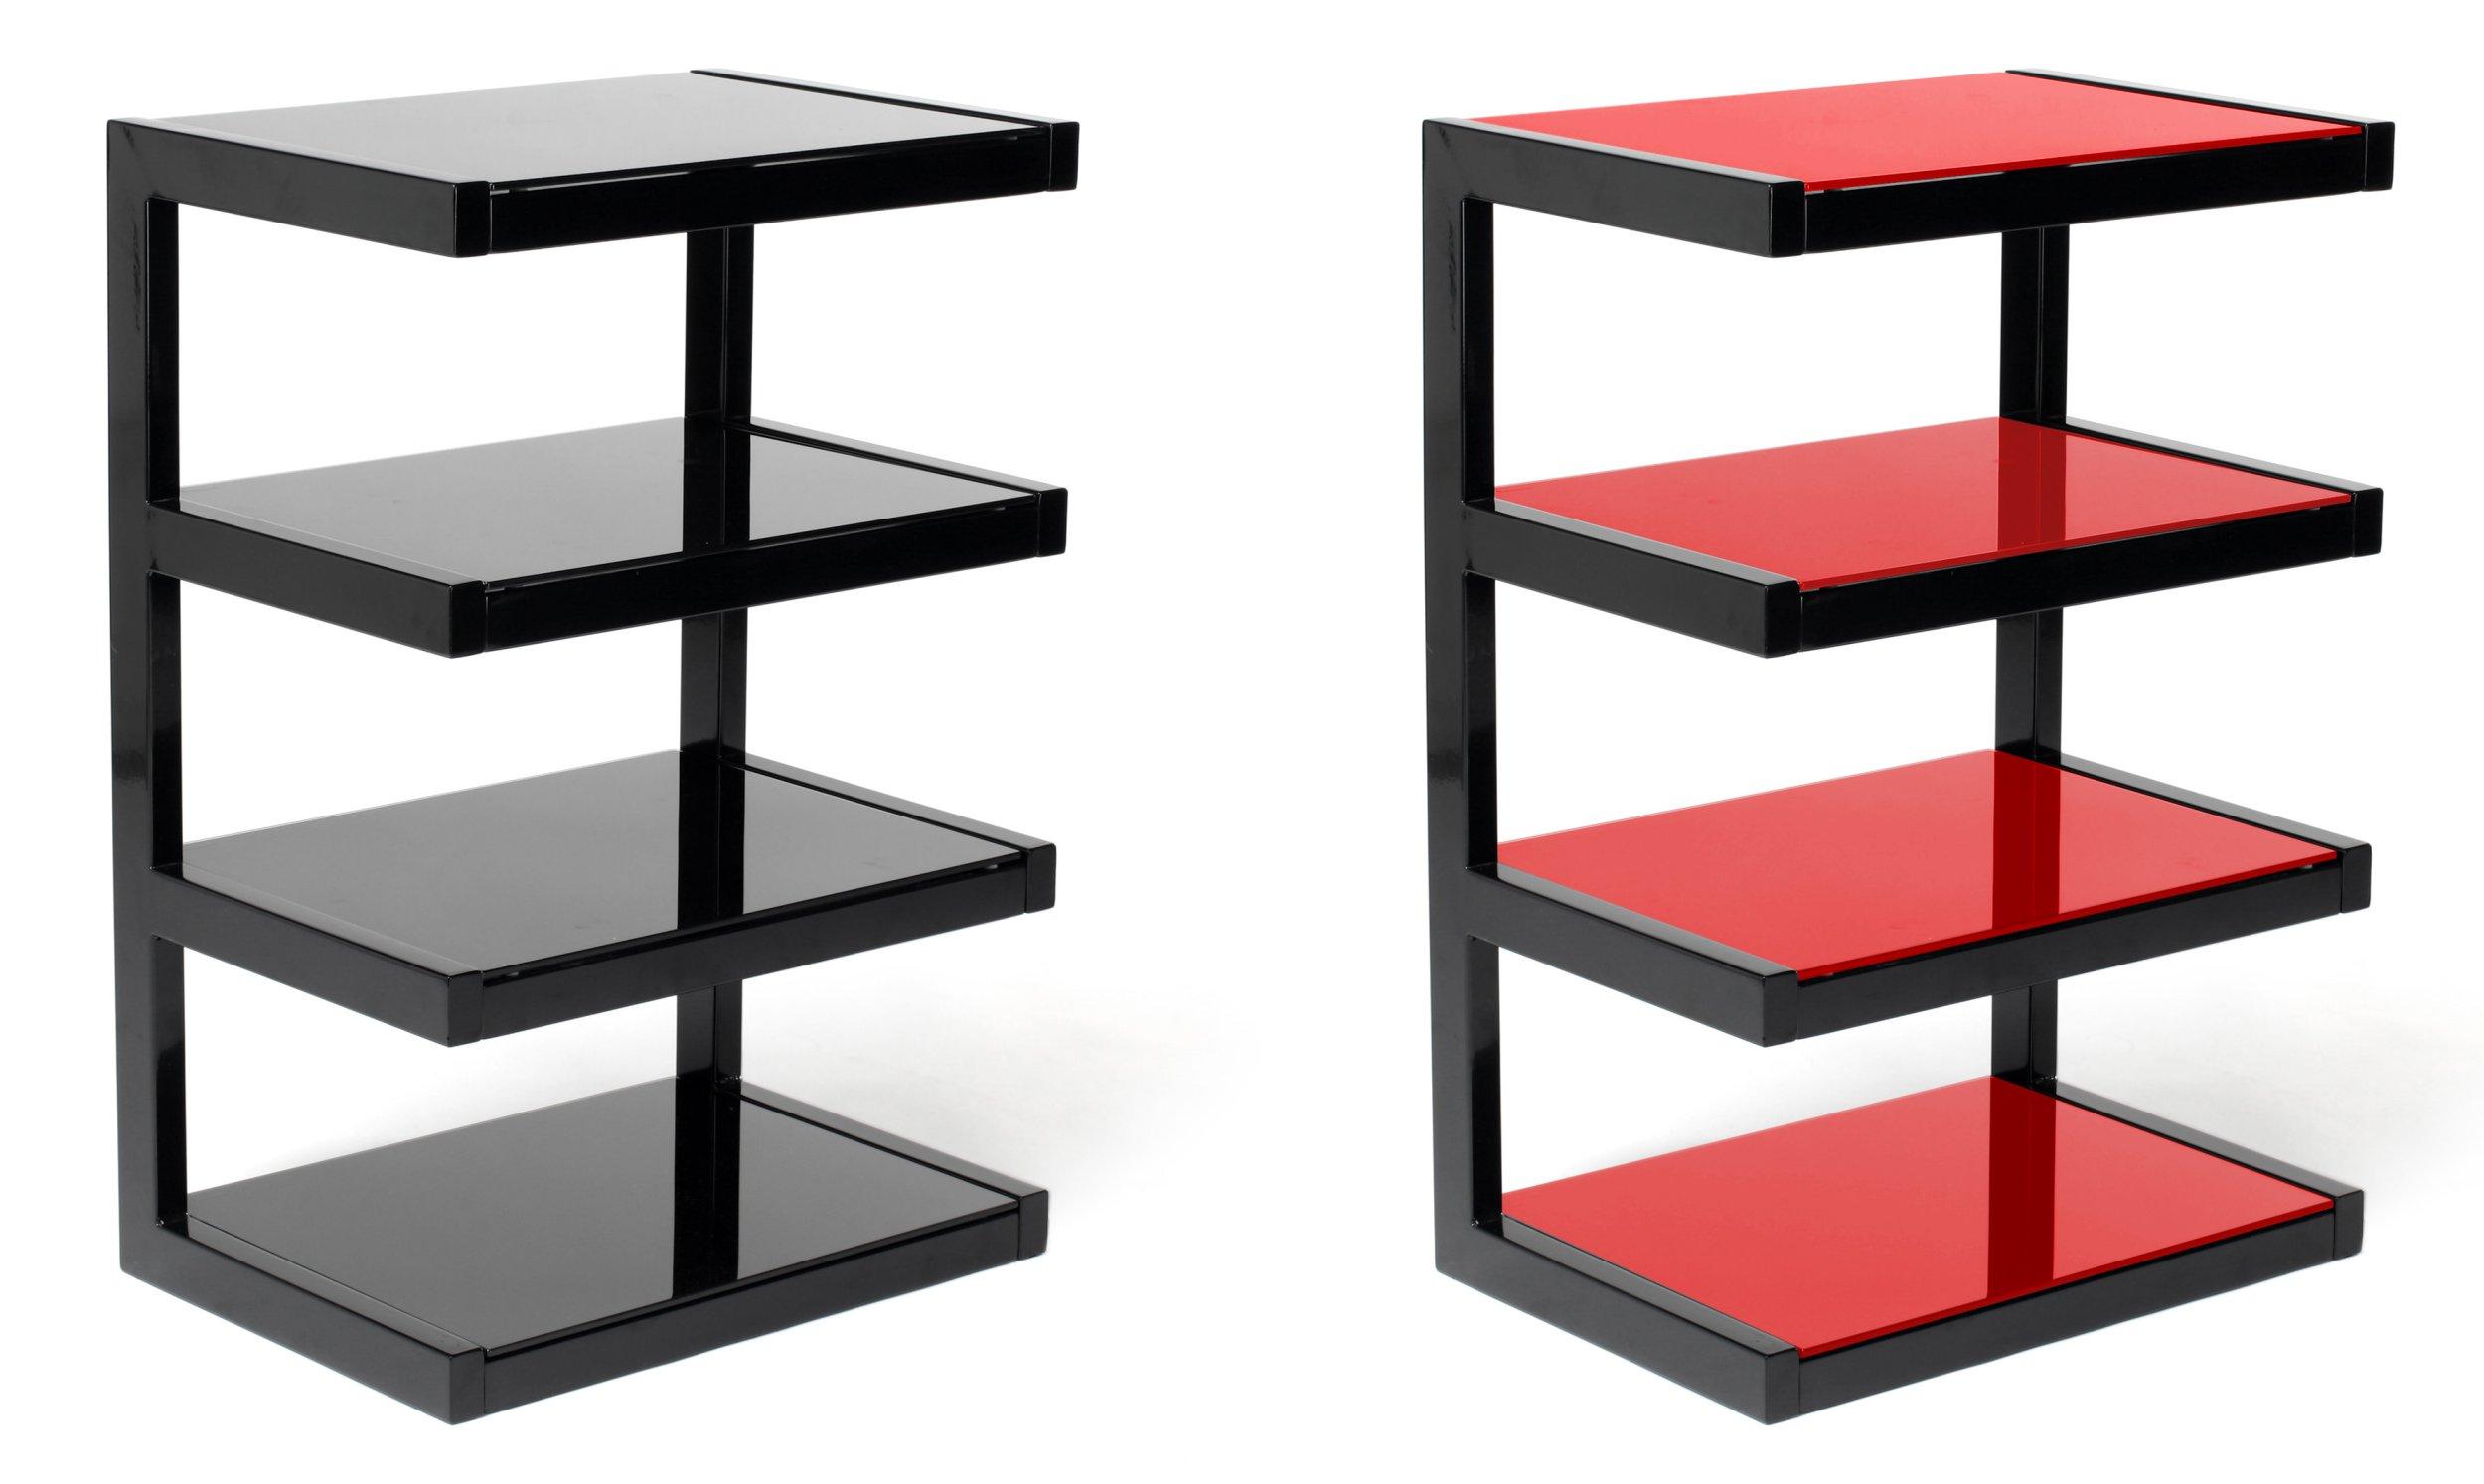 Tavolini Hi Fi : Mobili per hi fi stereo design casa creativa e